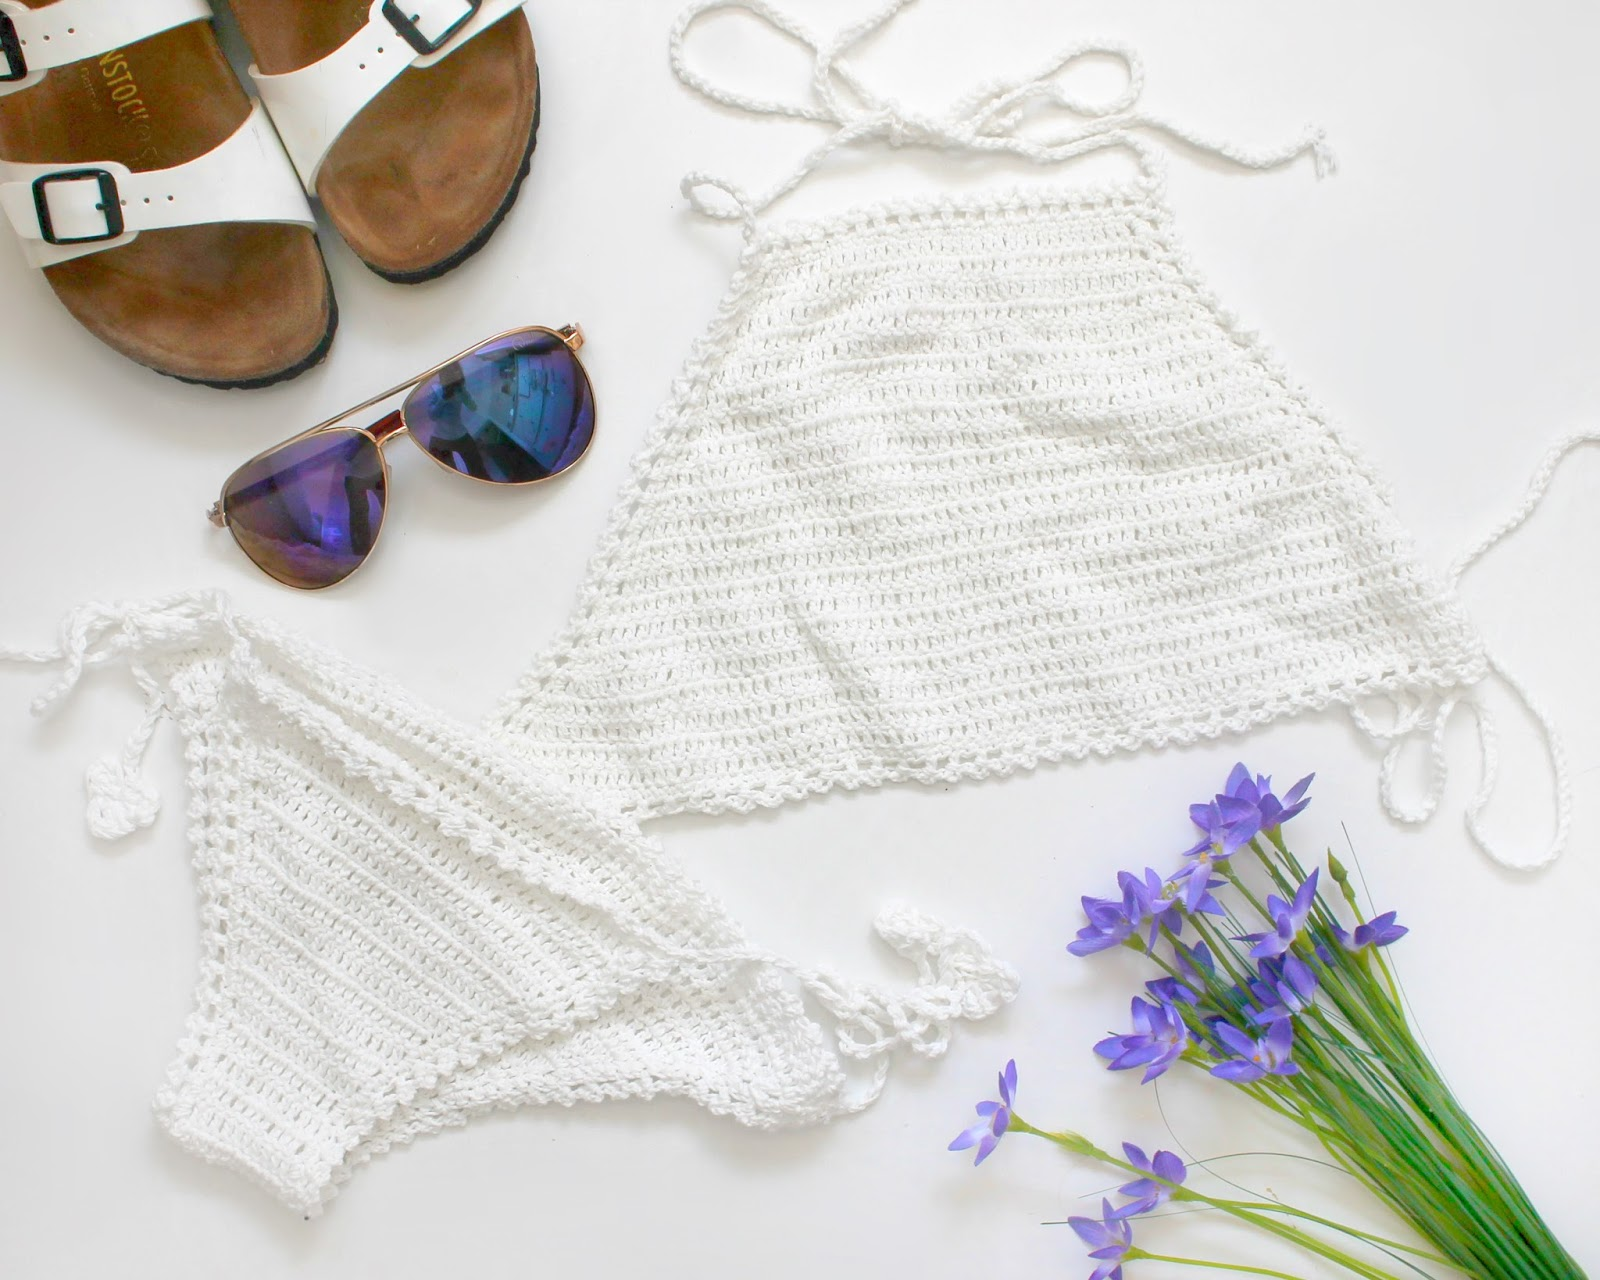 ShoppingThe Ebay Crochet BikinisFashion Ebay Influx ShoppingThe wPnOk08